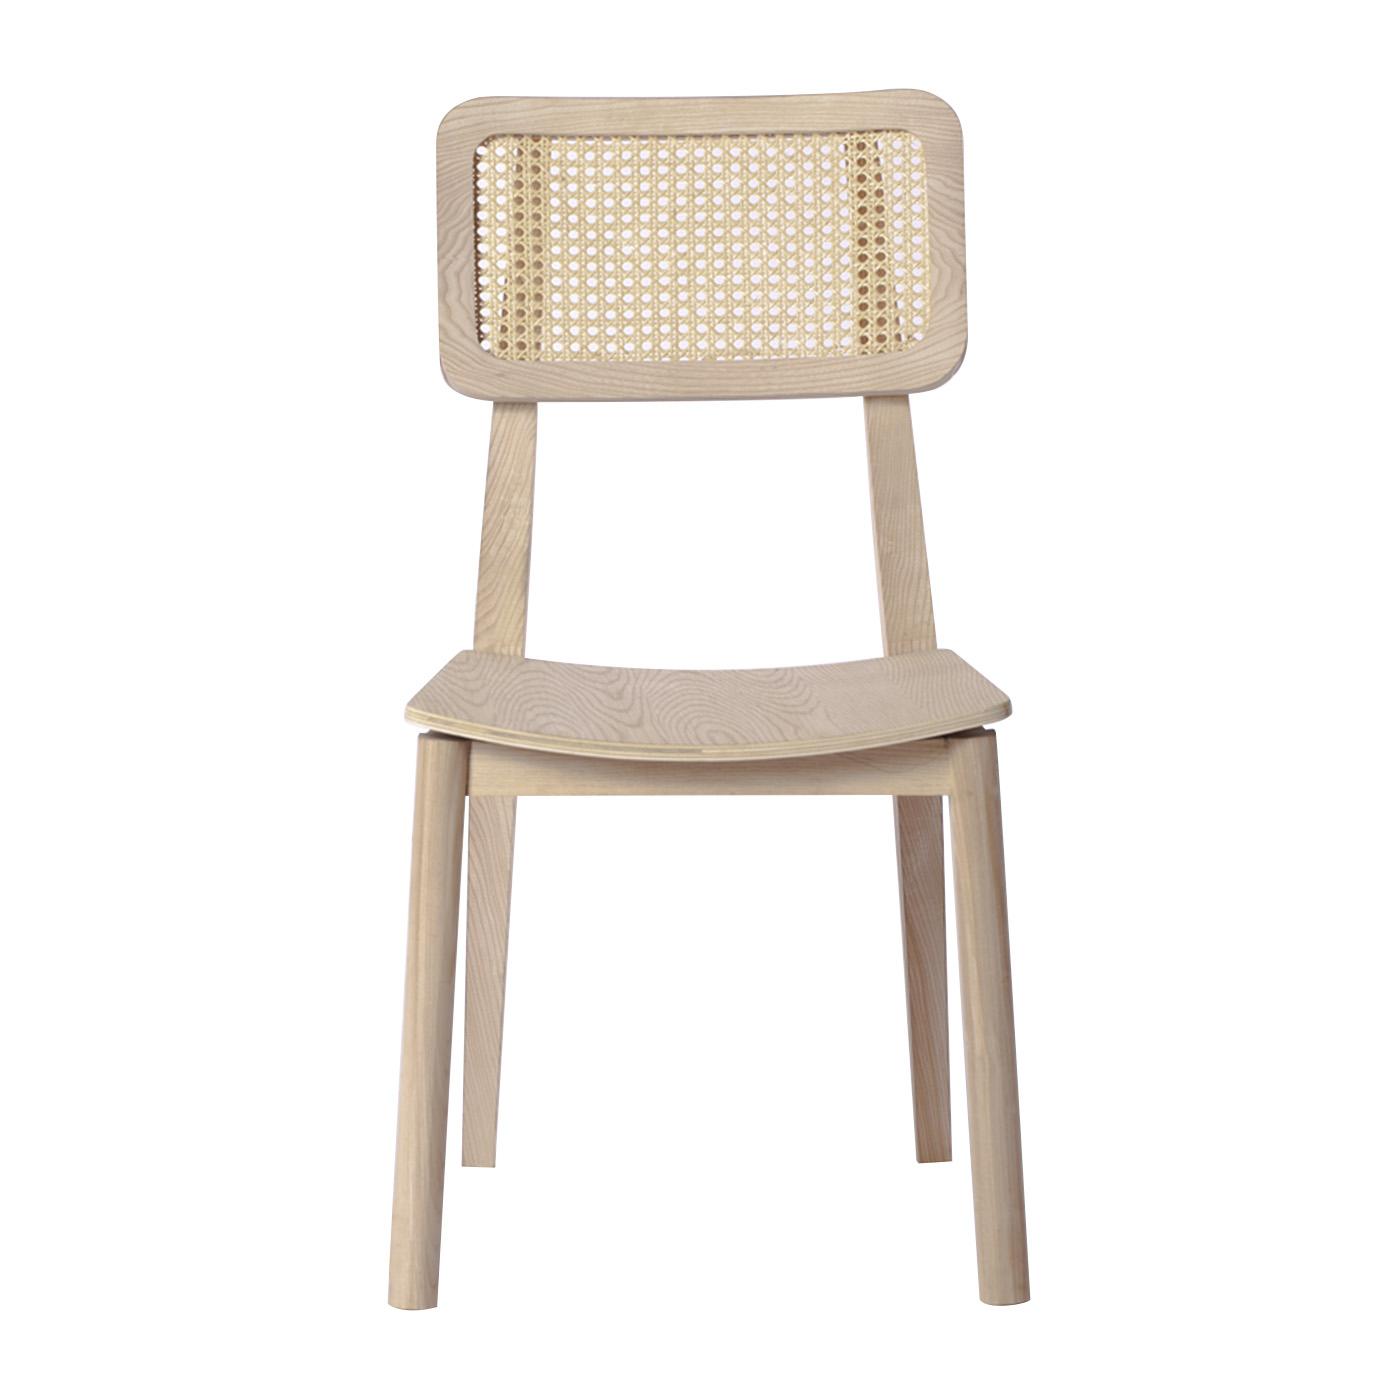 Ratargul Light Chair